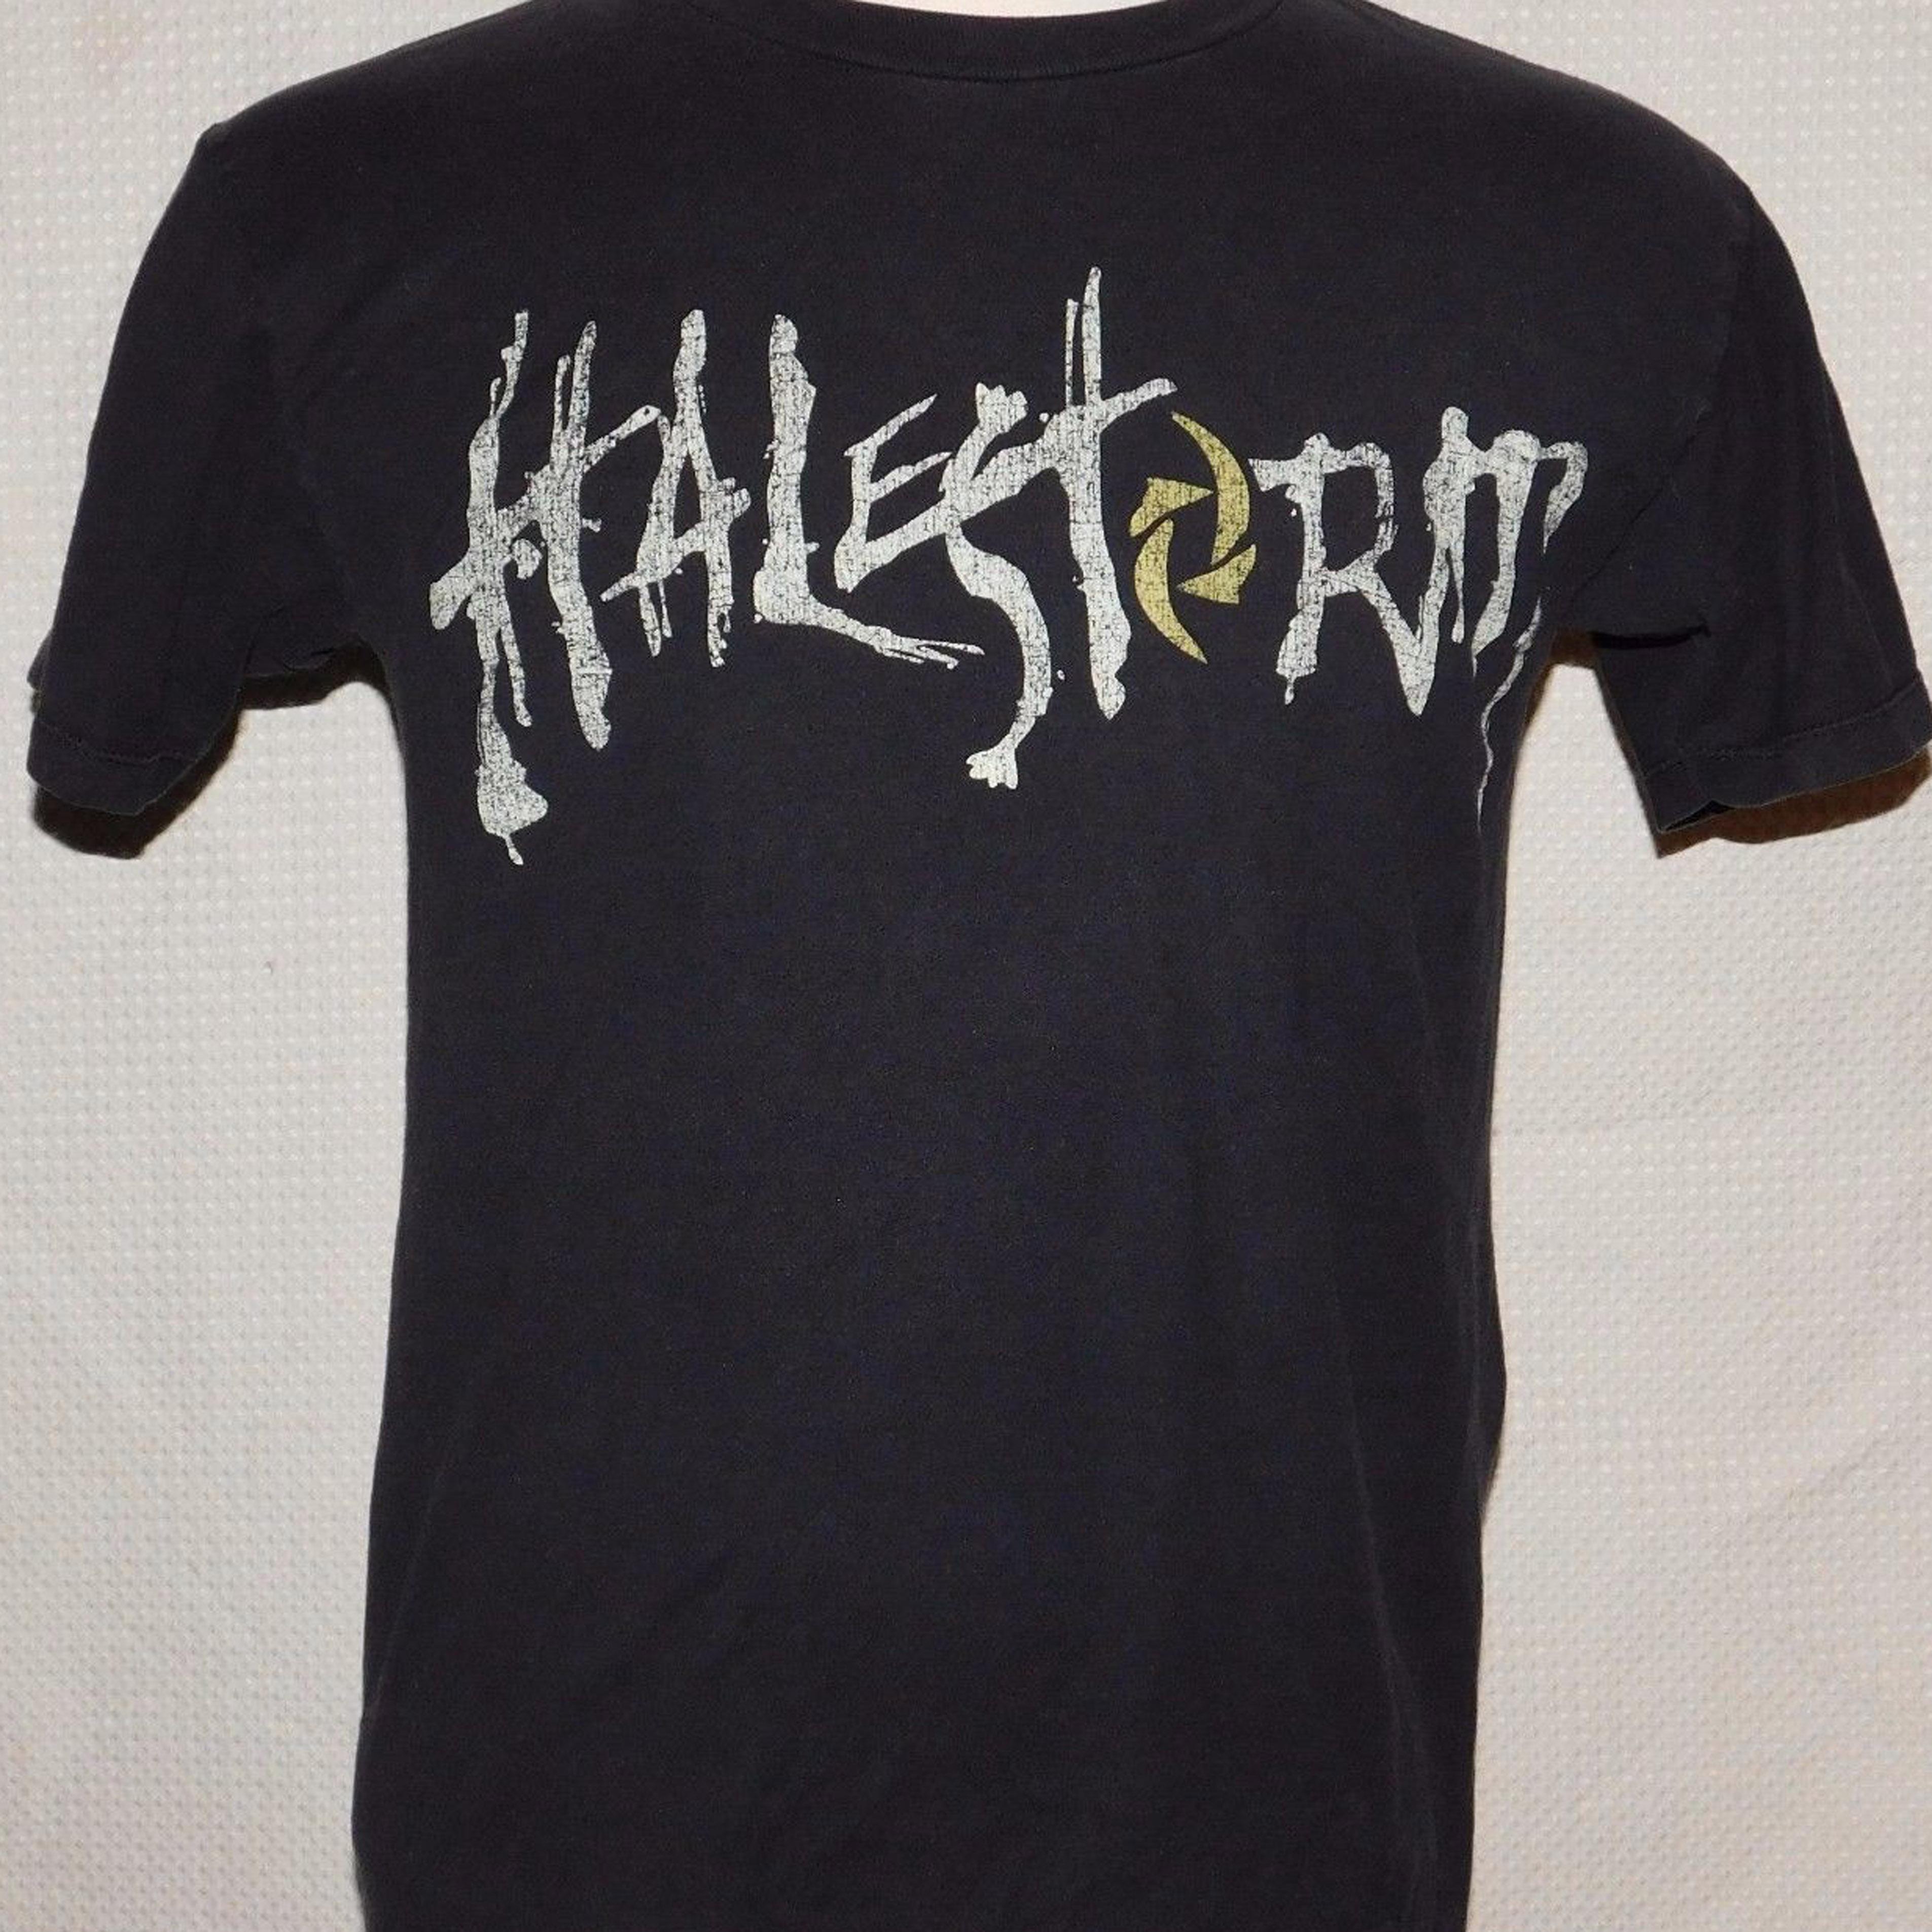 Short Sleeve Summer Style Mens Halestorm Hard Rock Band Skull & Arrow Print T Shirt Sz M Lzzy Hale